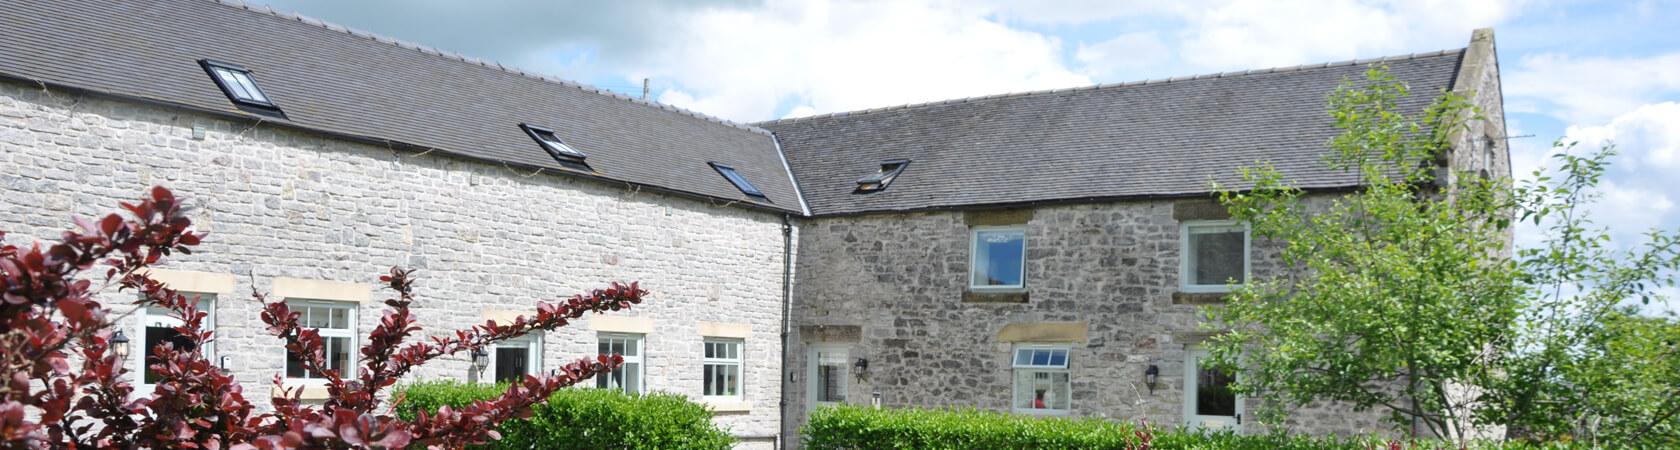 endmoor farm cottages